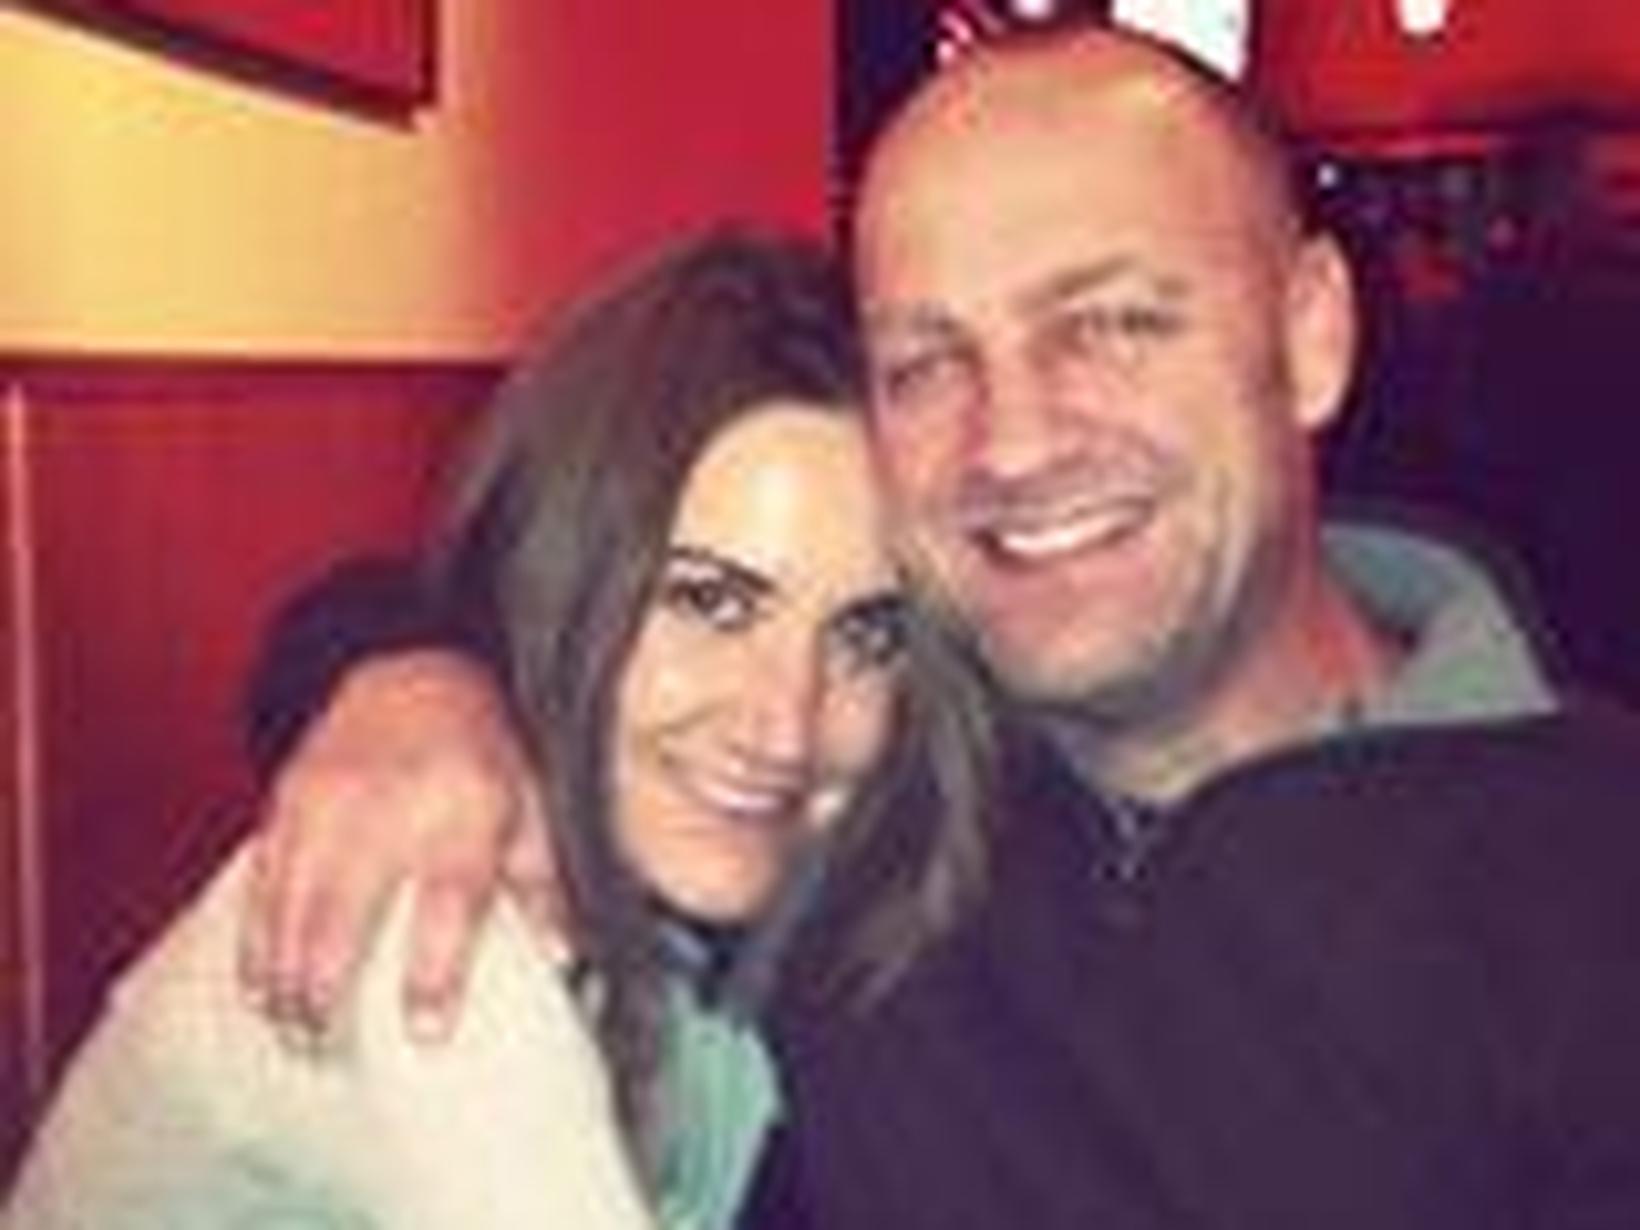 John & Jocelyn from San Diego, California, United States